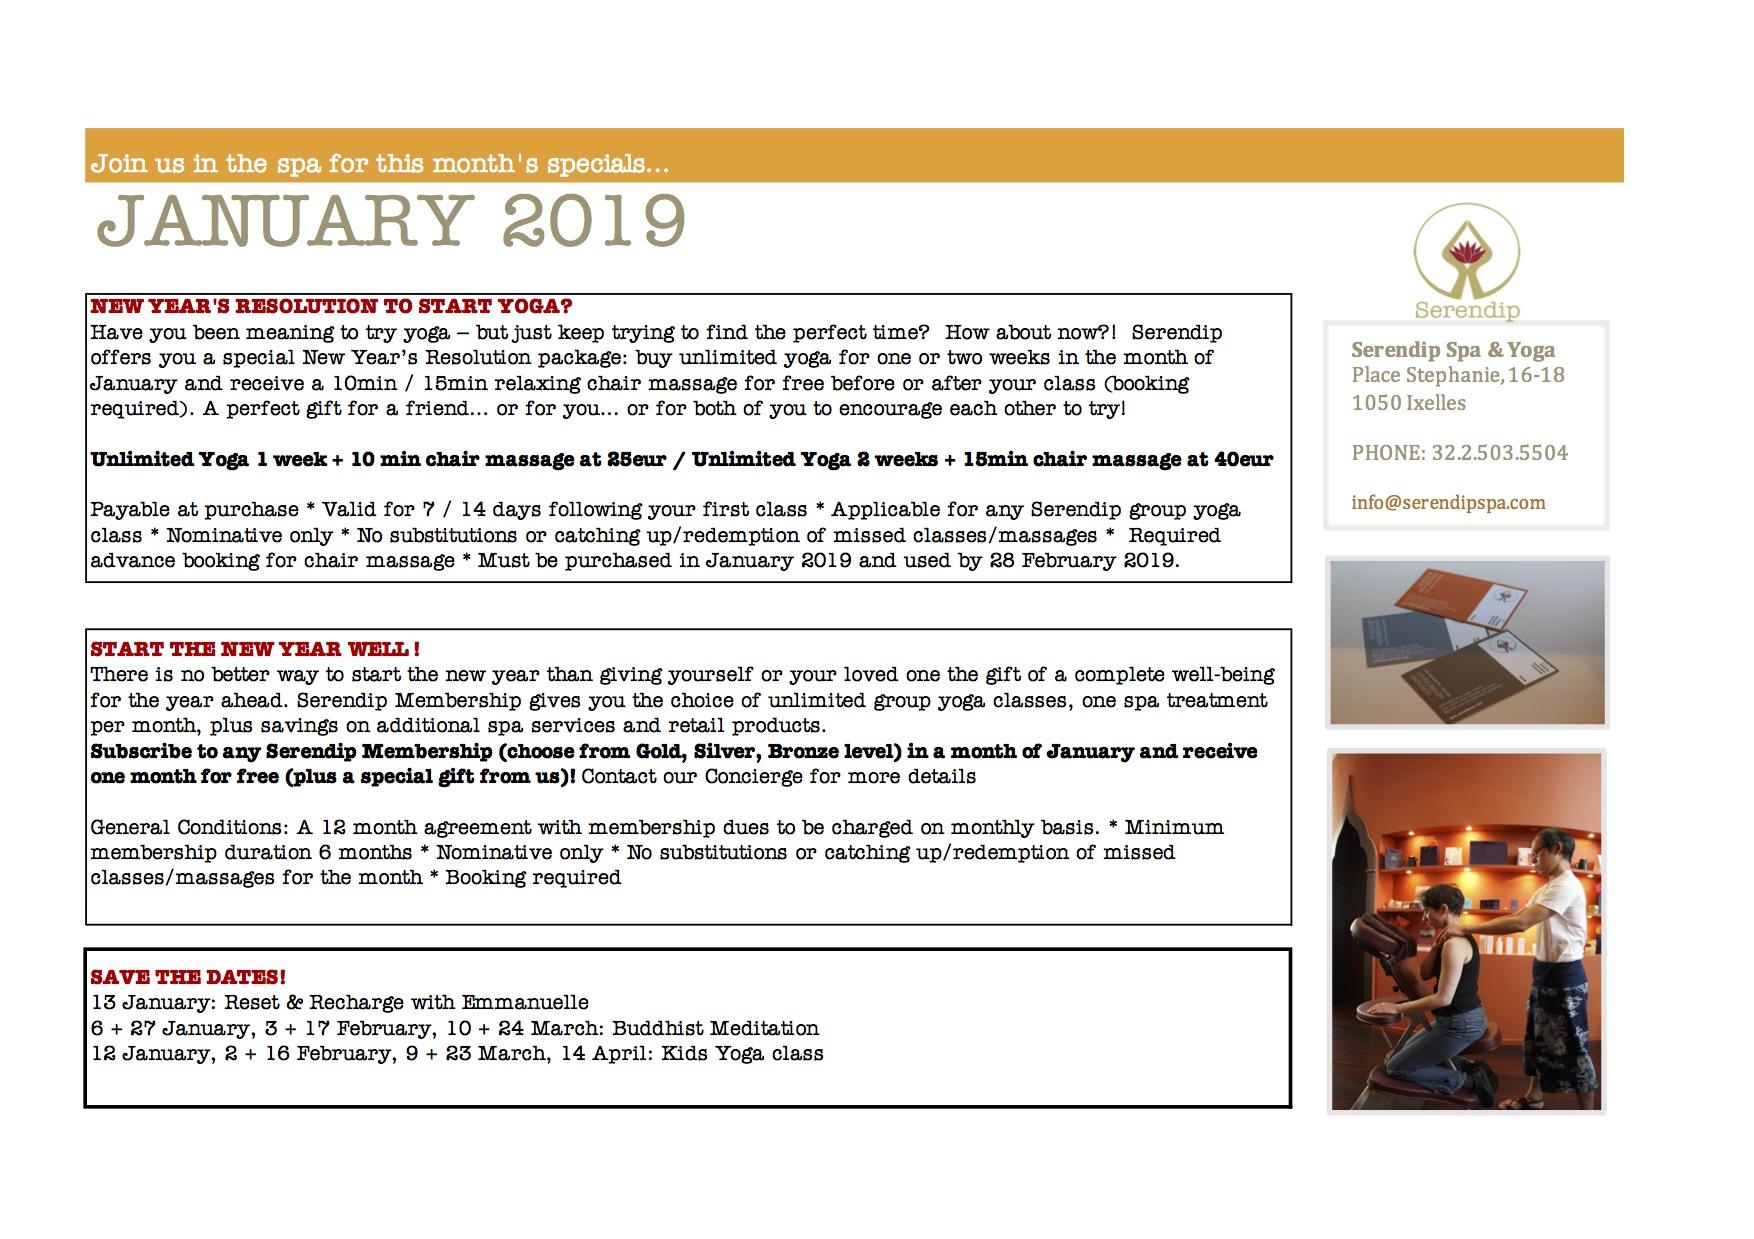 serendip spa and yoga calendar 2019_January A4 BACK.jpg